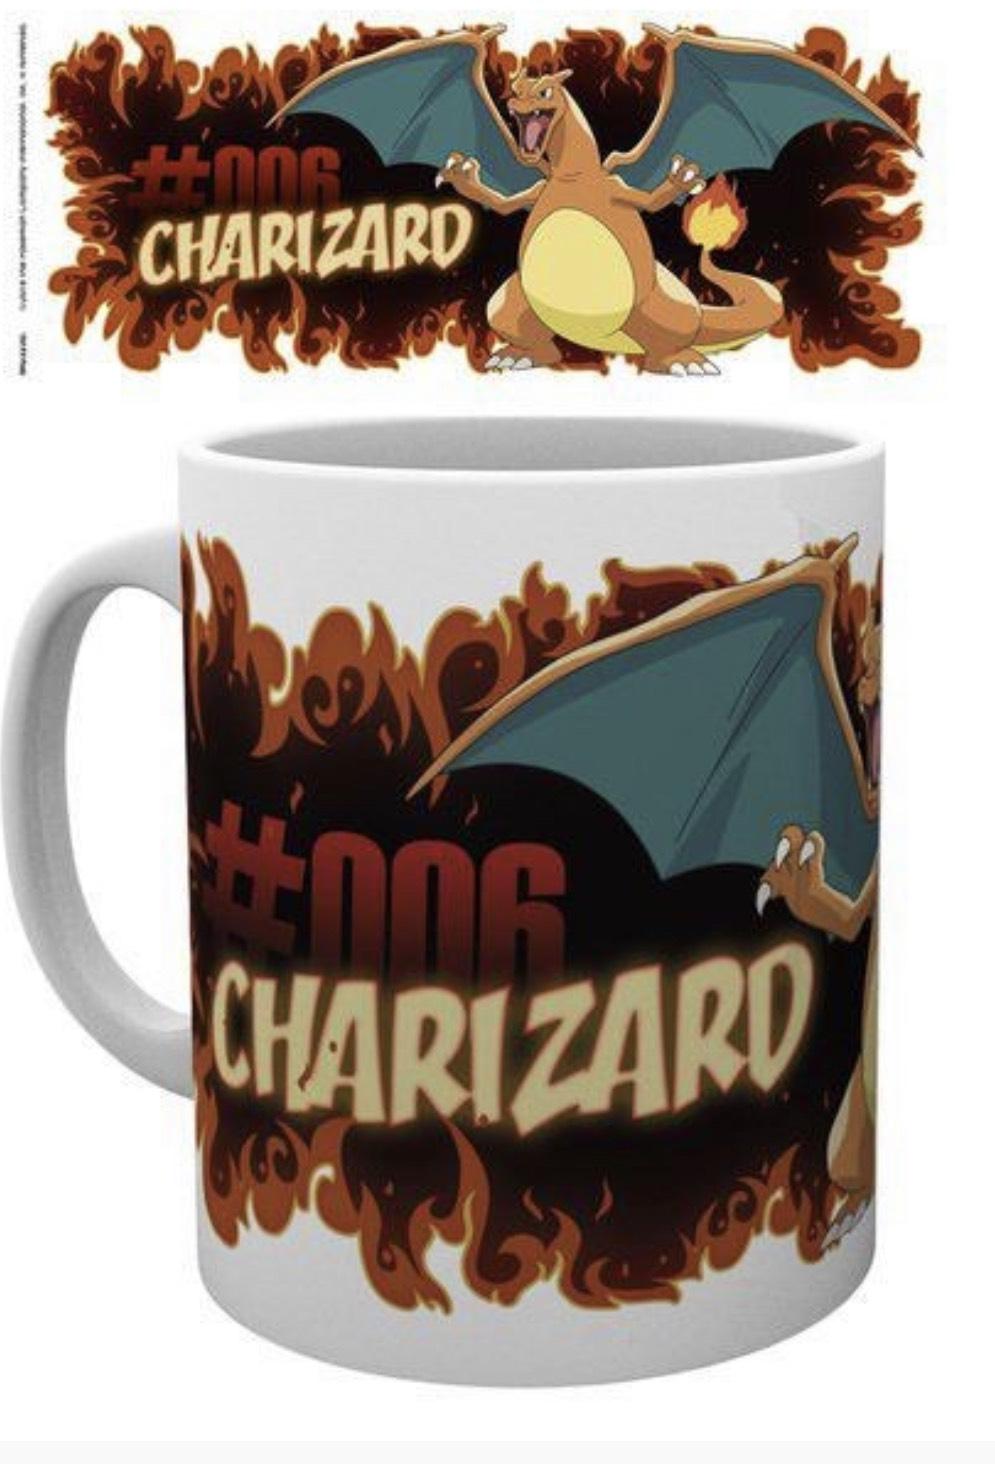 Pokémon - Tasse Glurak, Offiziell Lizensiert.